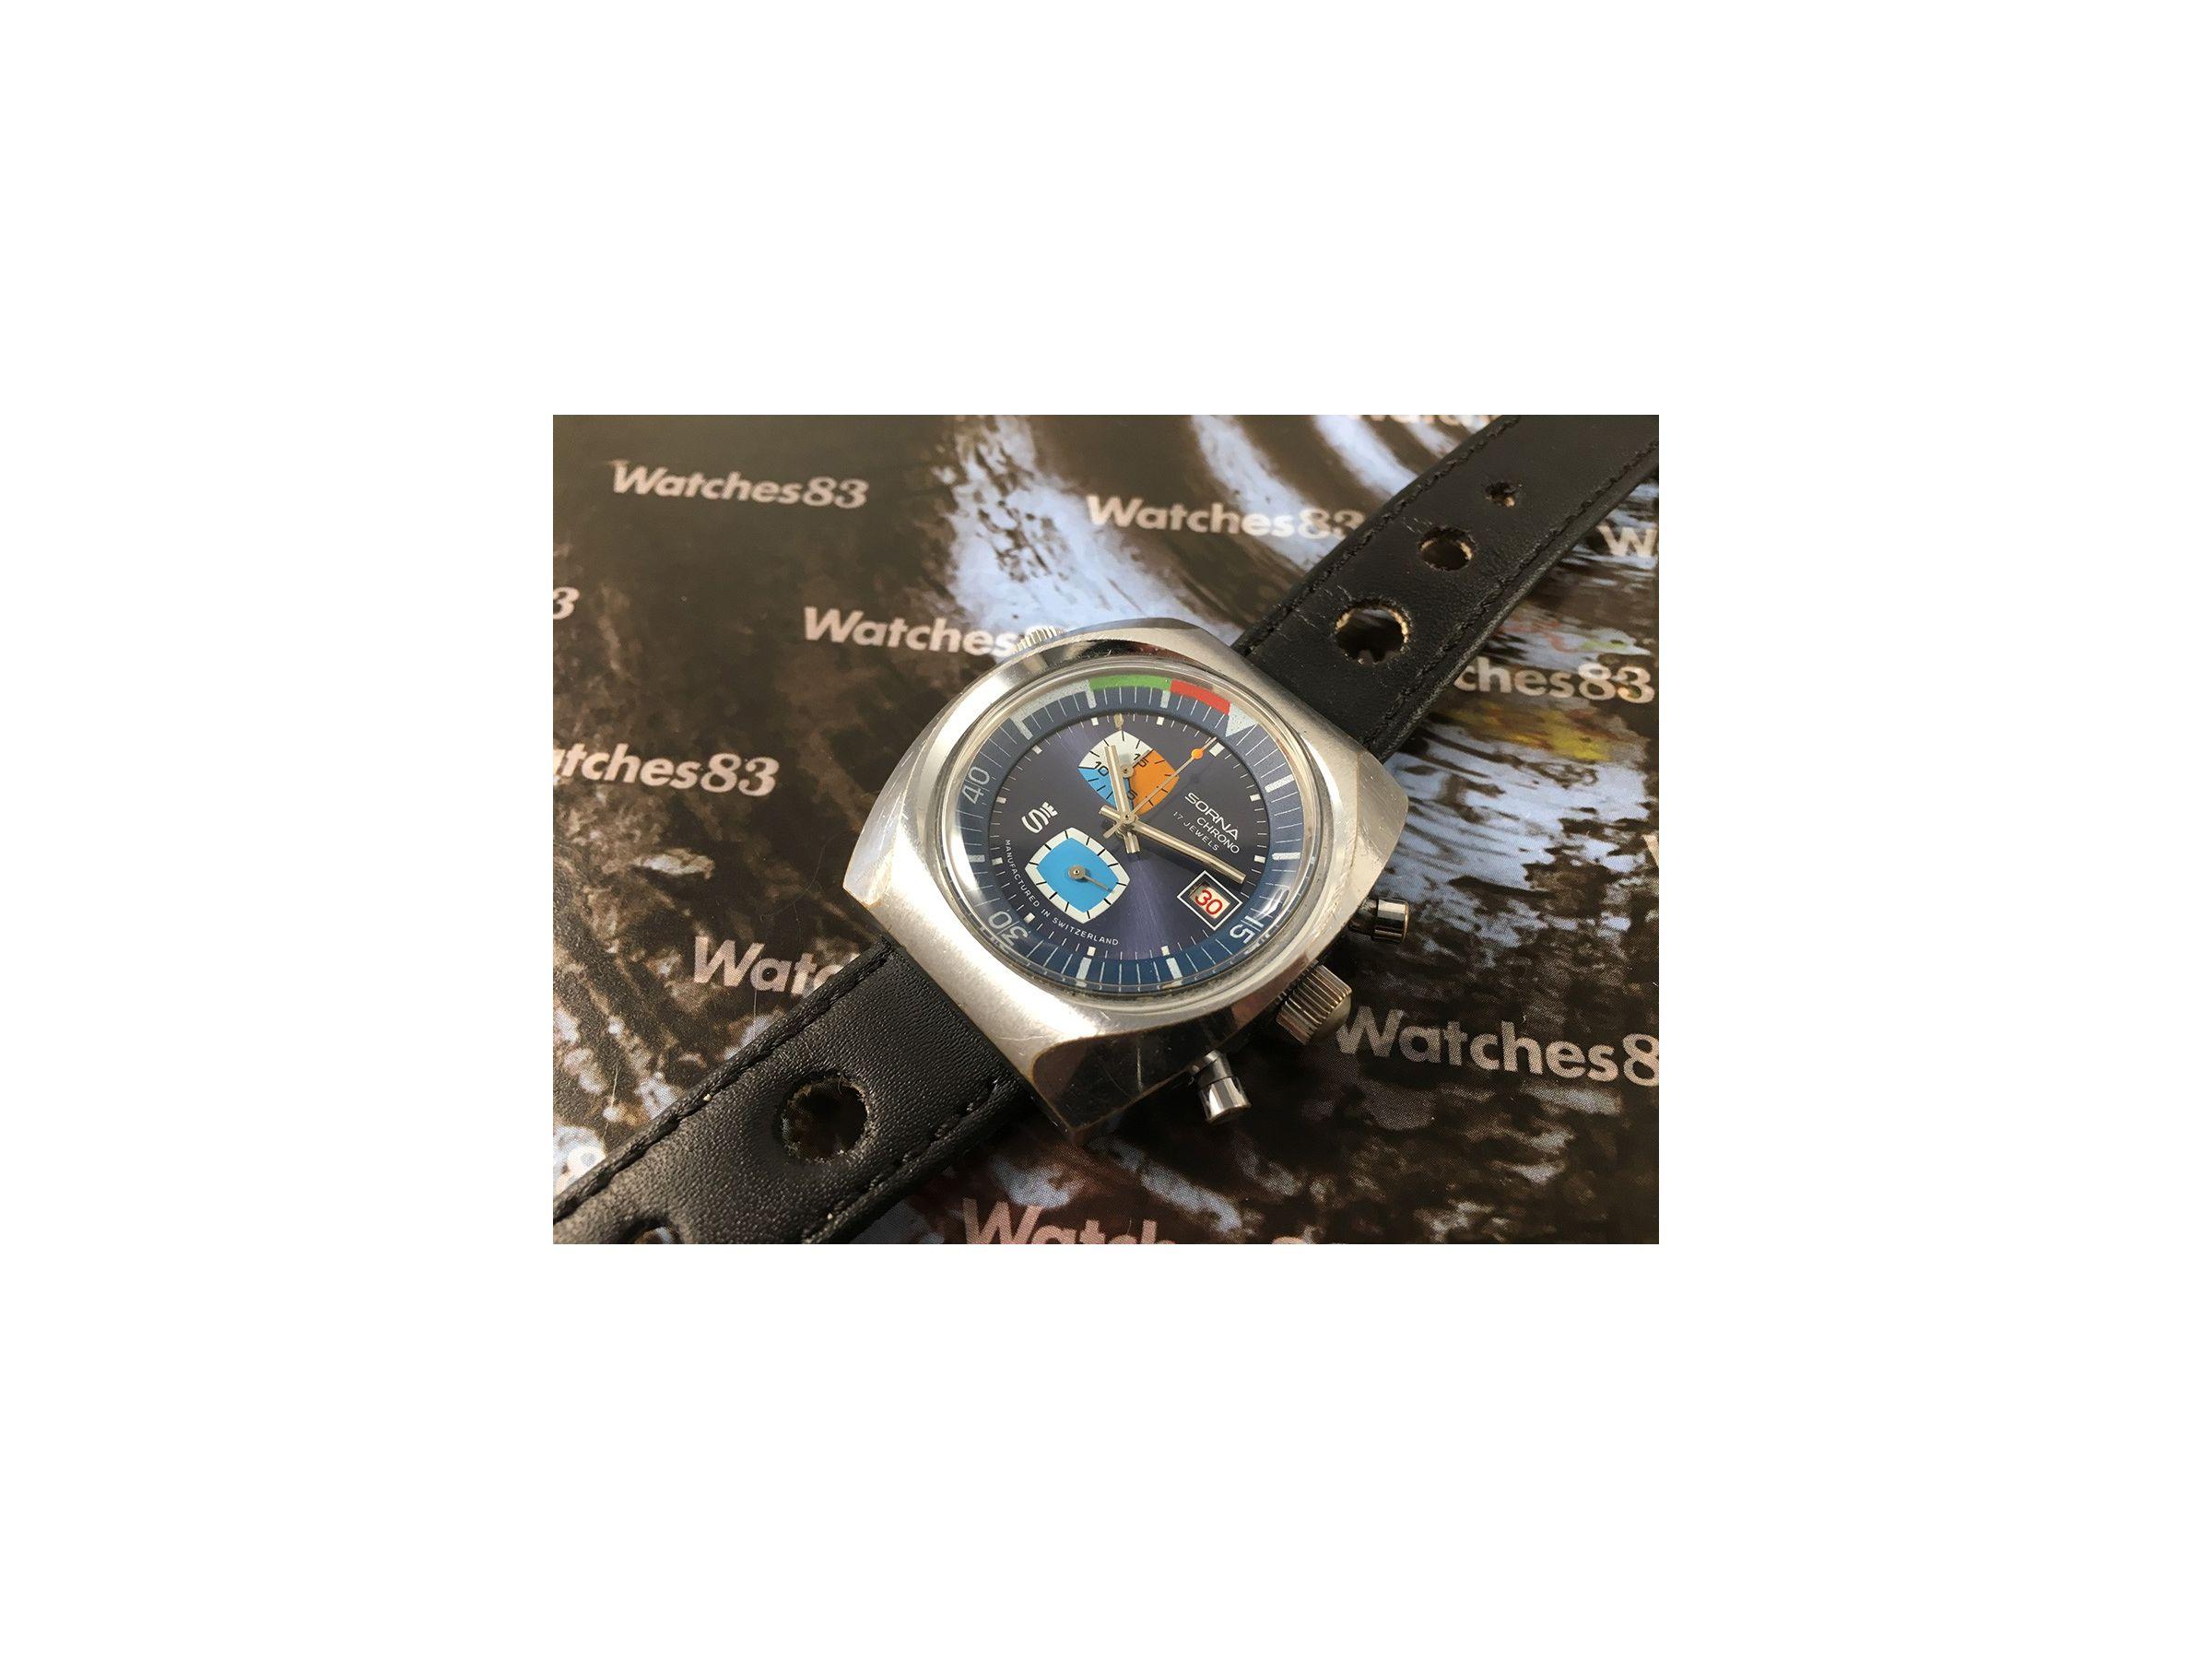 Sorna Antiguo Cuerda Manual Watches83 Reloj Cronógrafo De Crono PXkiuZO